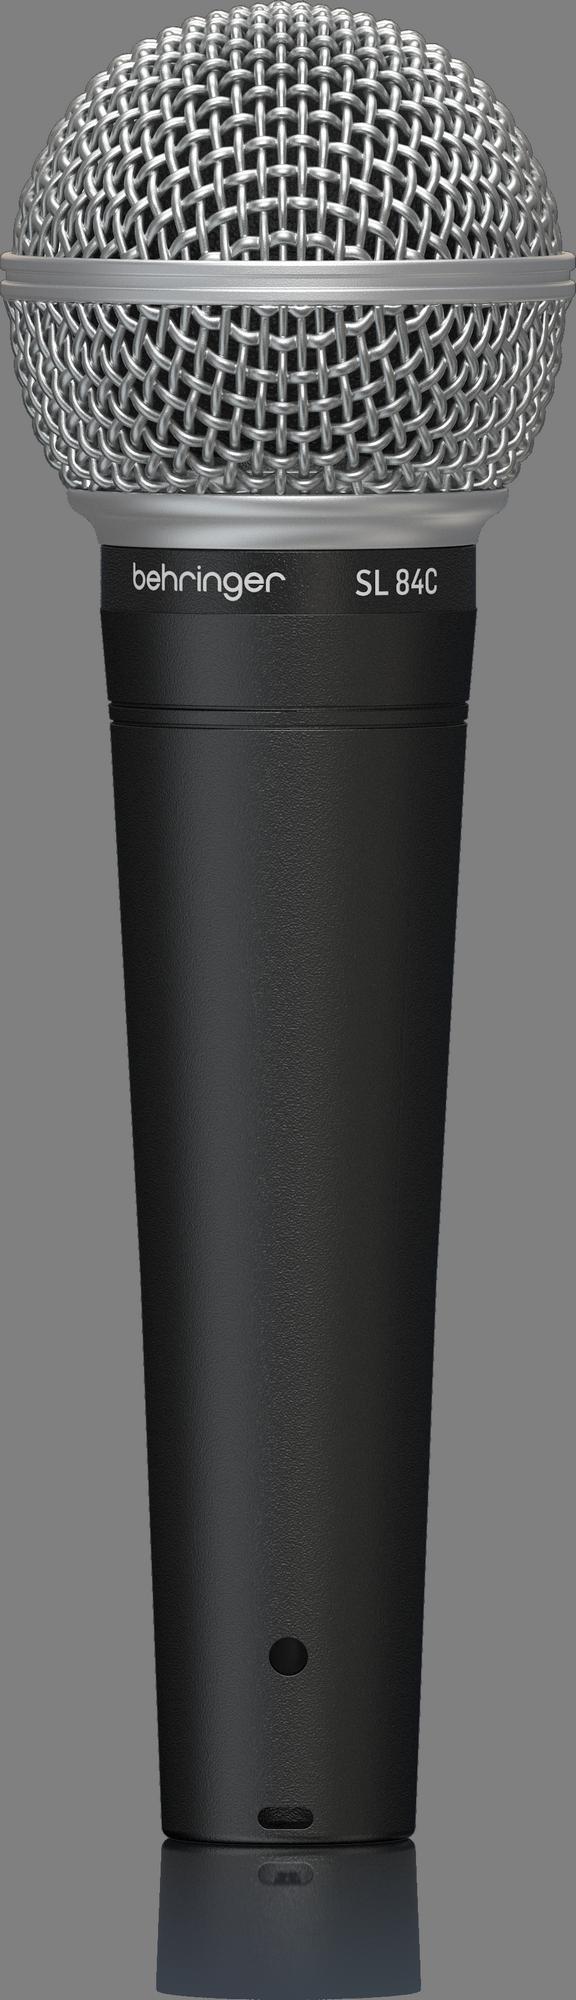 Behringer SL 84C - Sprachmikrofon